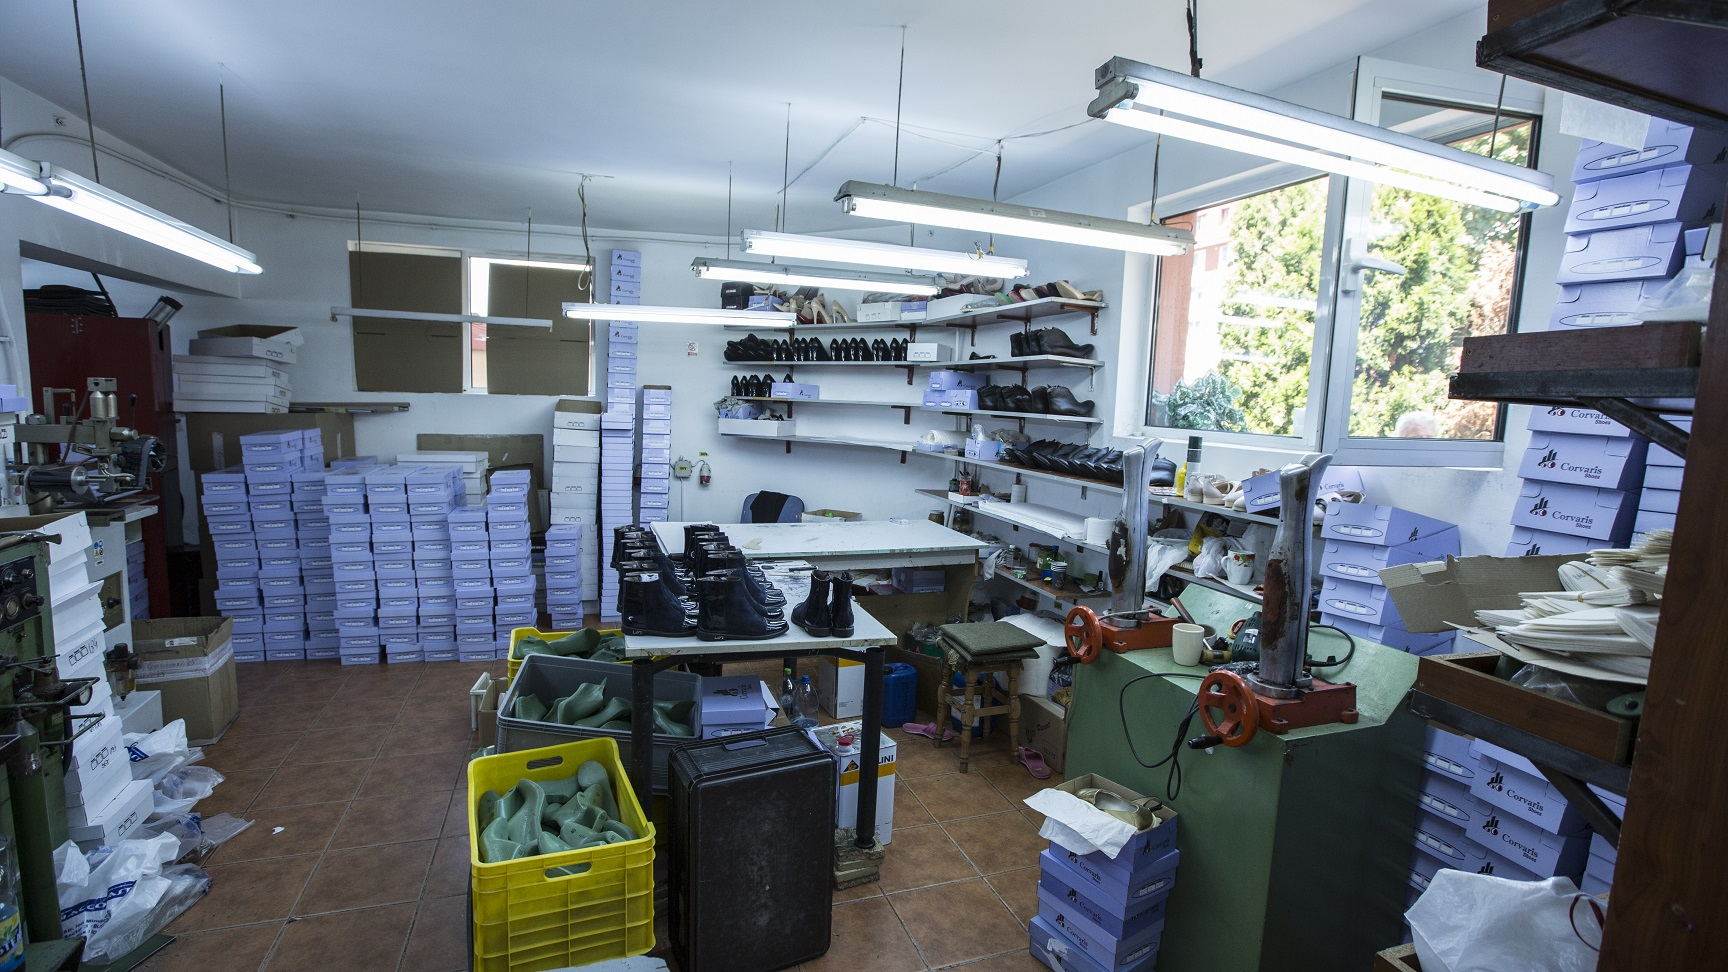 depozit-fabrica-pantofi-genti-piele-Popesti-Leordeni